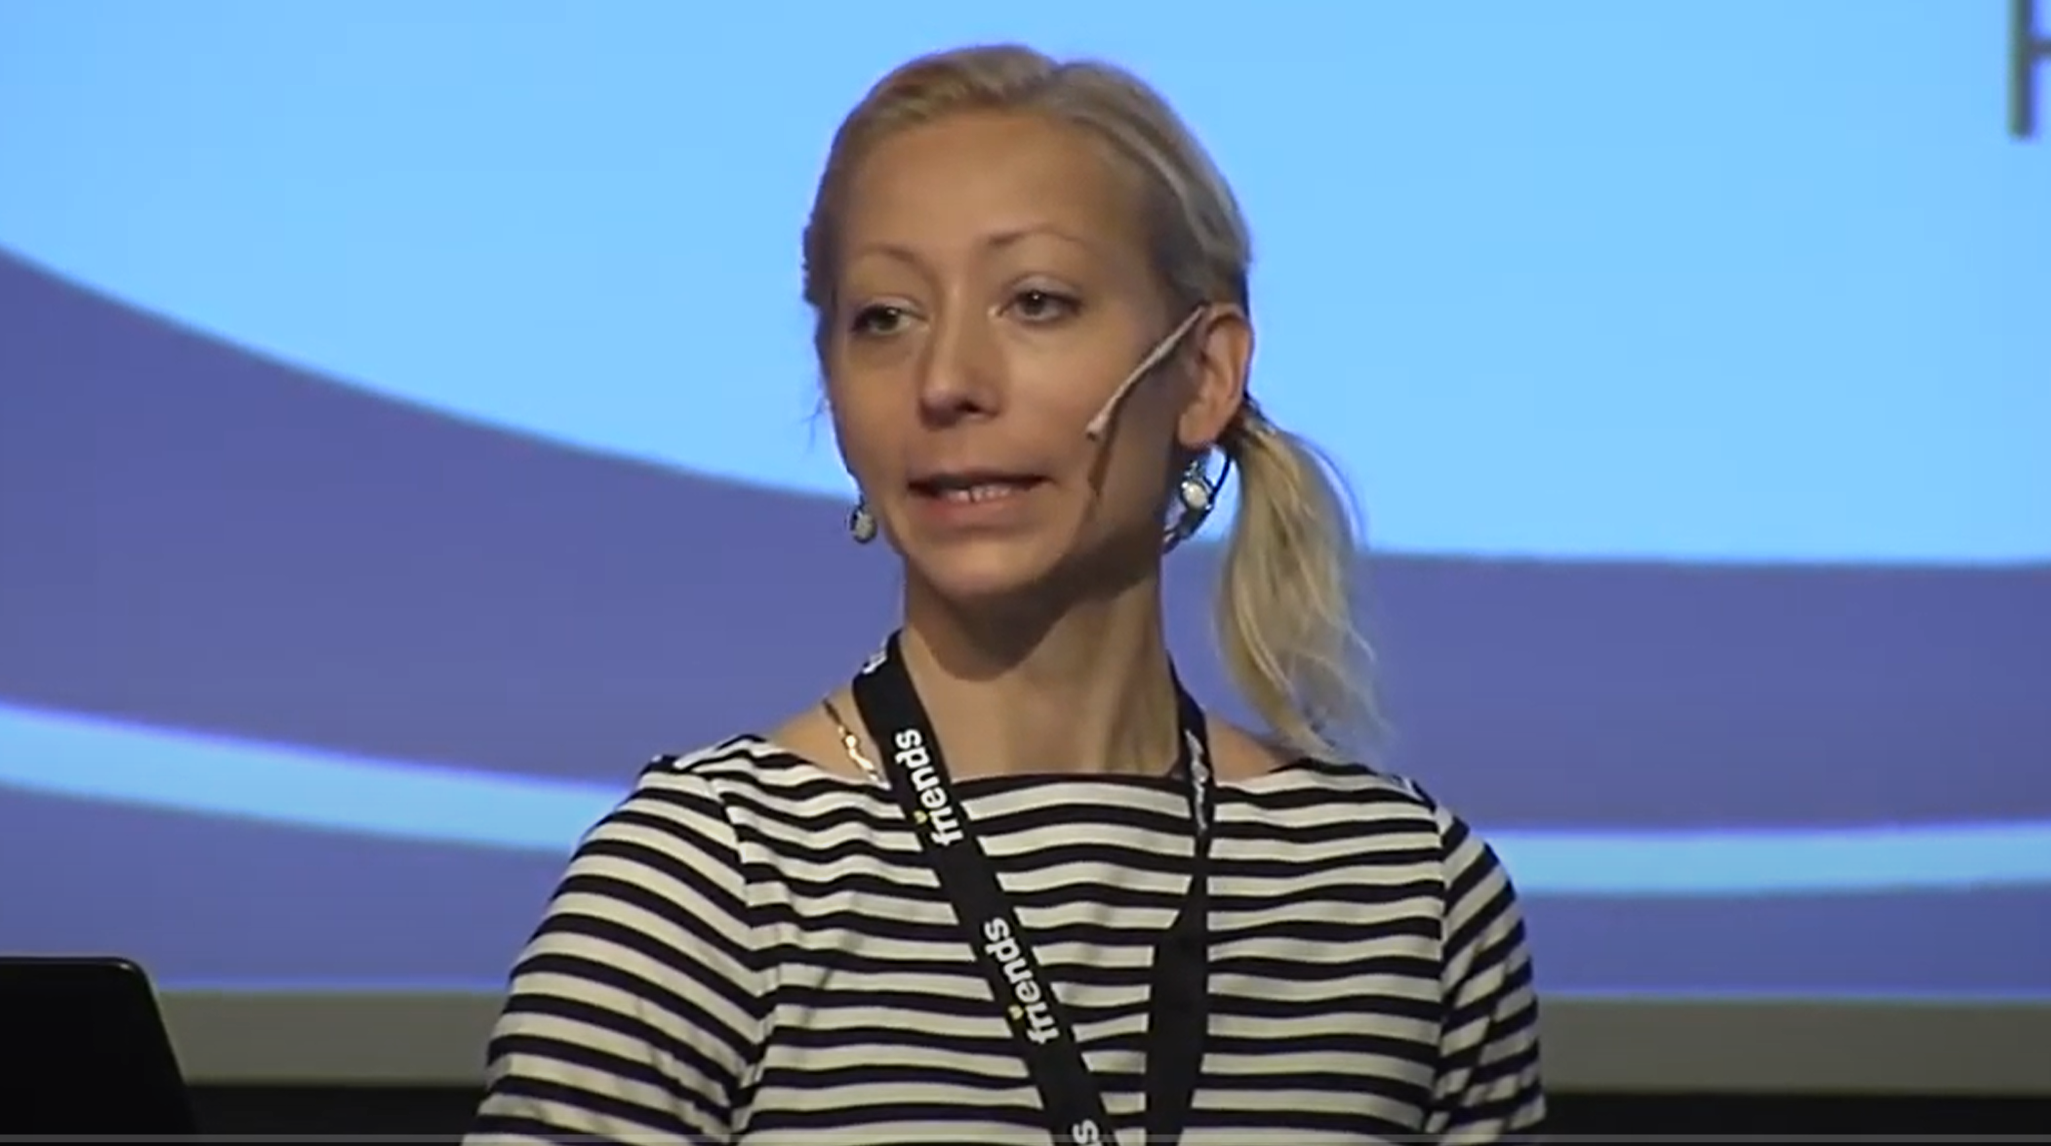 Miia Sainio Speaker WABF 2017